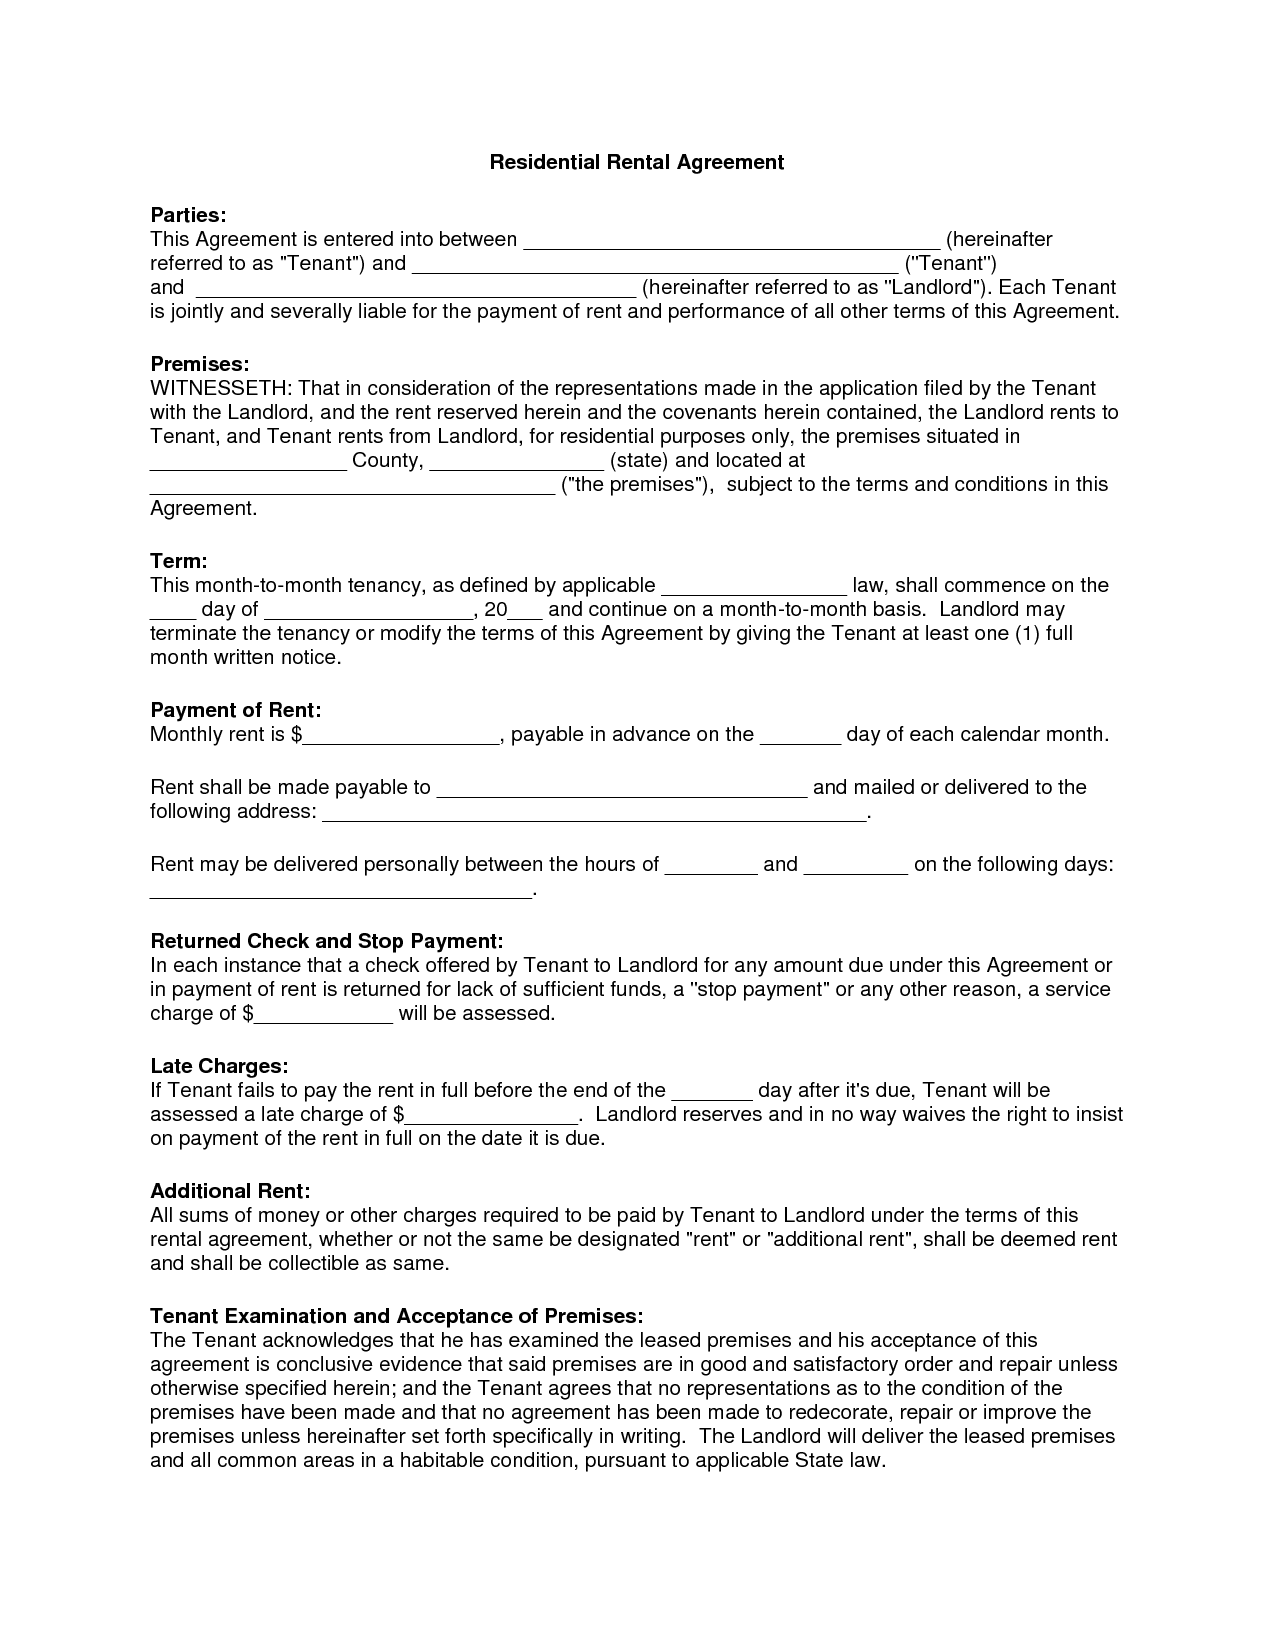 Free Copy Rental Lease Agreement | Residential Rental Agreement ...